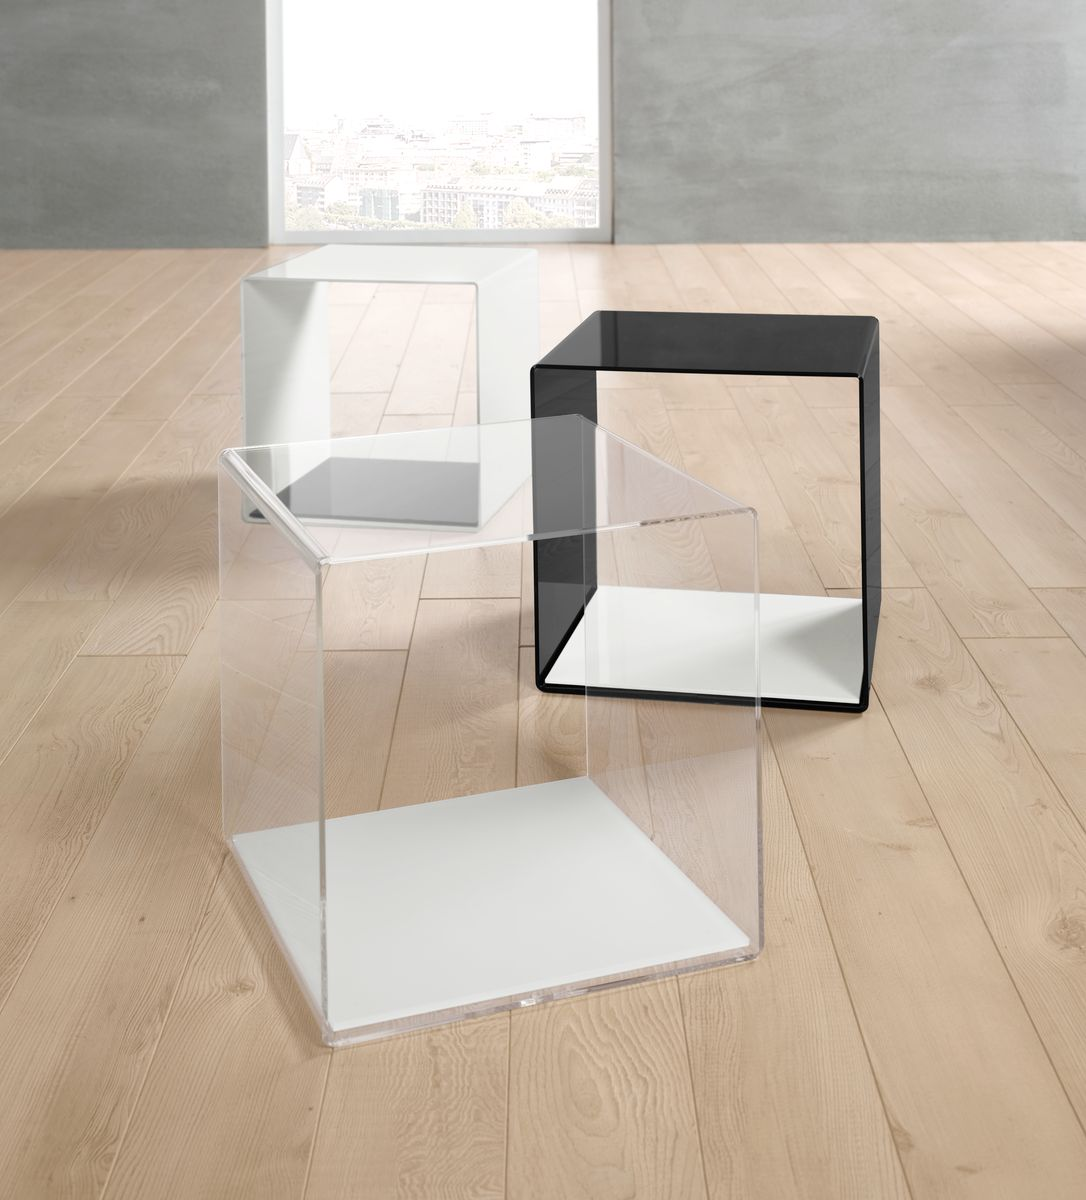 plexiglas w rfel g nstig kaufen sch fer shop. Black Bedroom Furniture Sets. Home Design Ideas